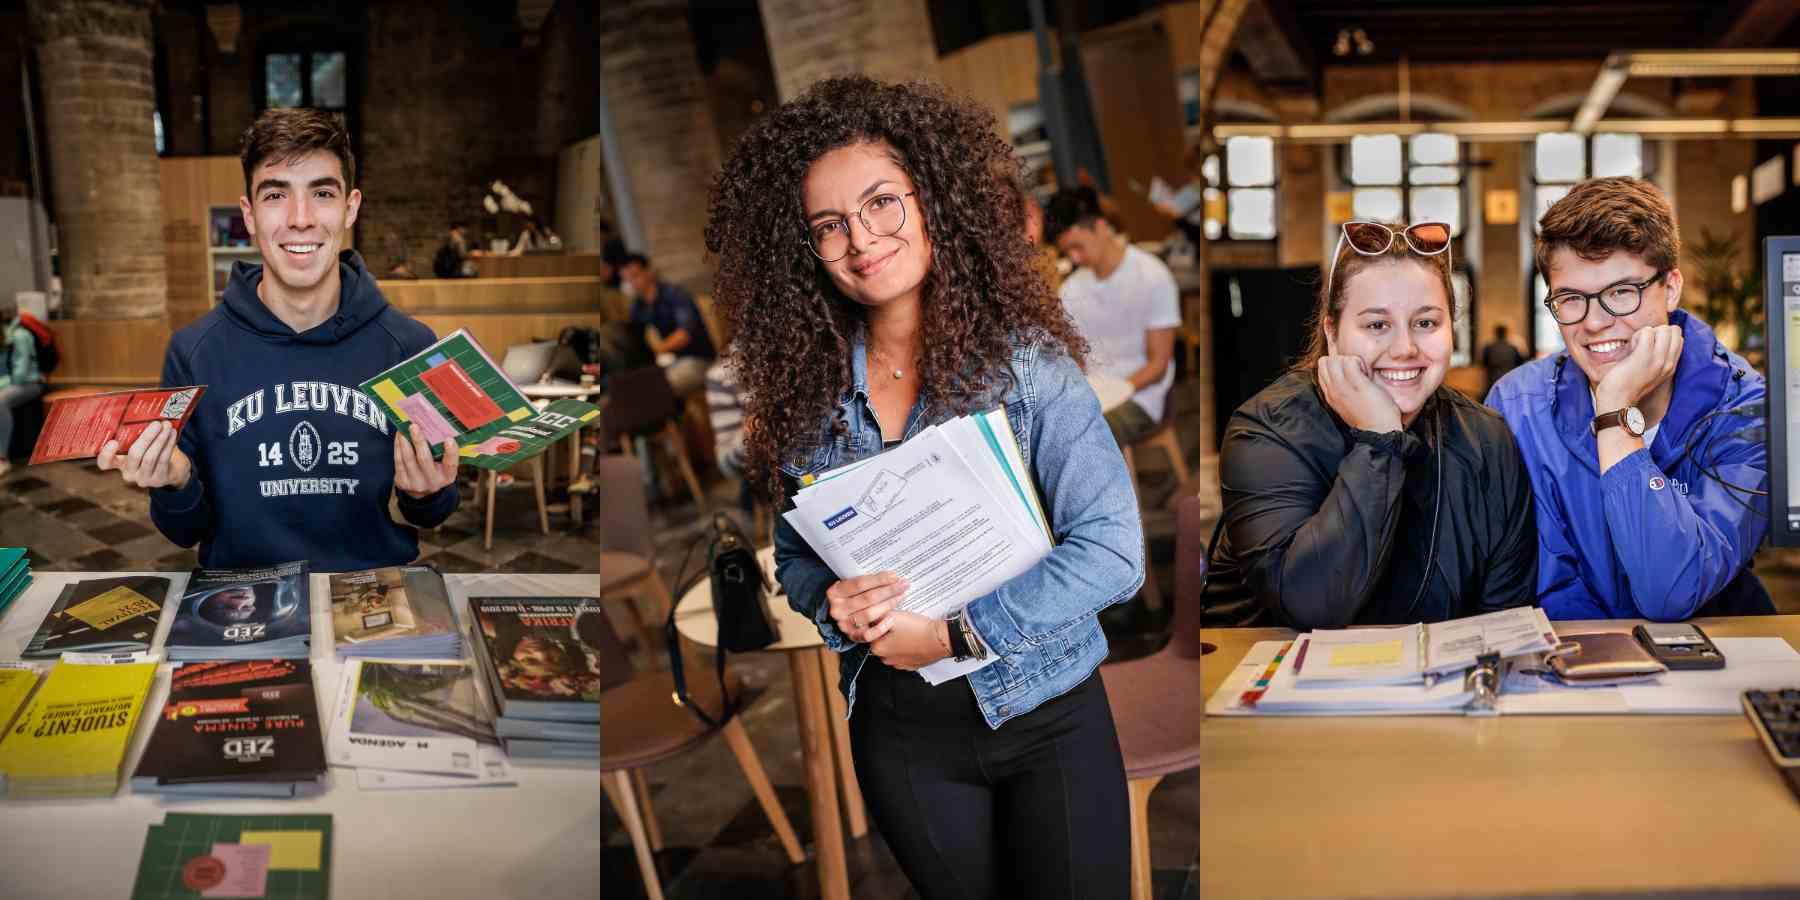 Izabela and Ian's passion for international politics led them to KU Leuven.